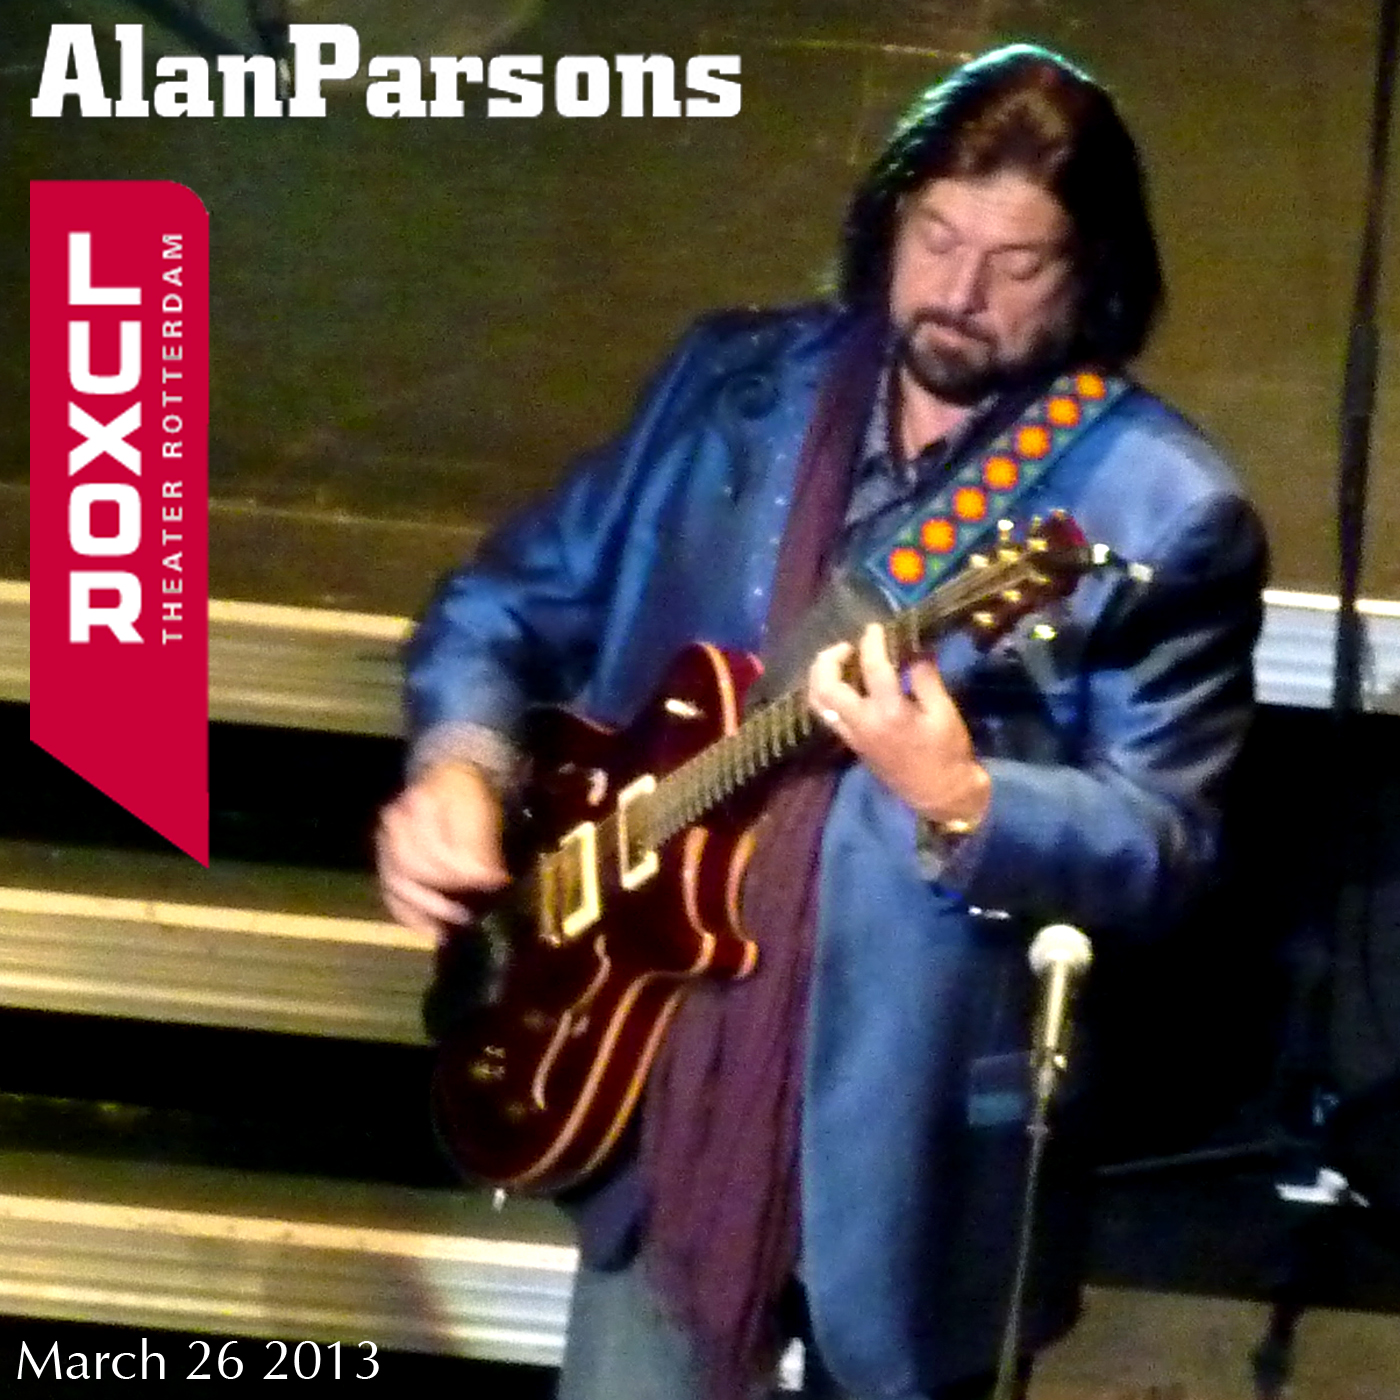 AlanParsons2013-03-27NieuweLuxorTheaterRotterdamHolland1.jpg